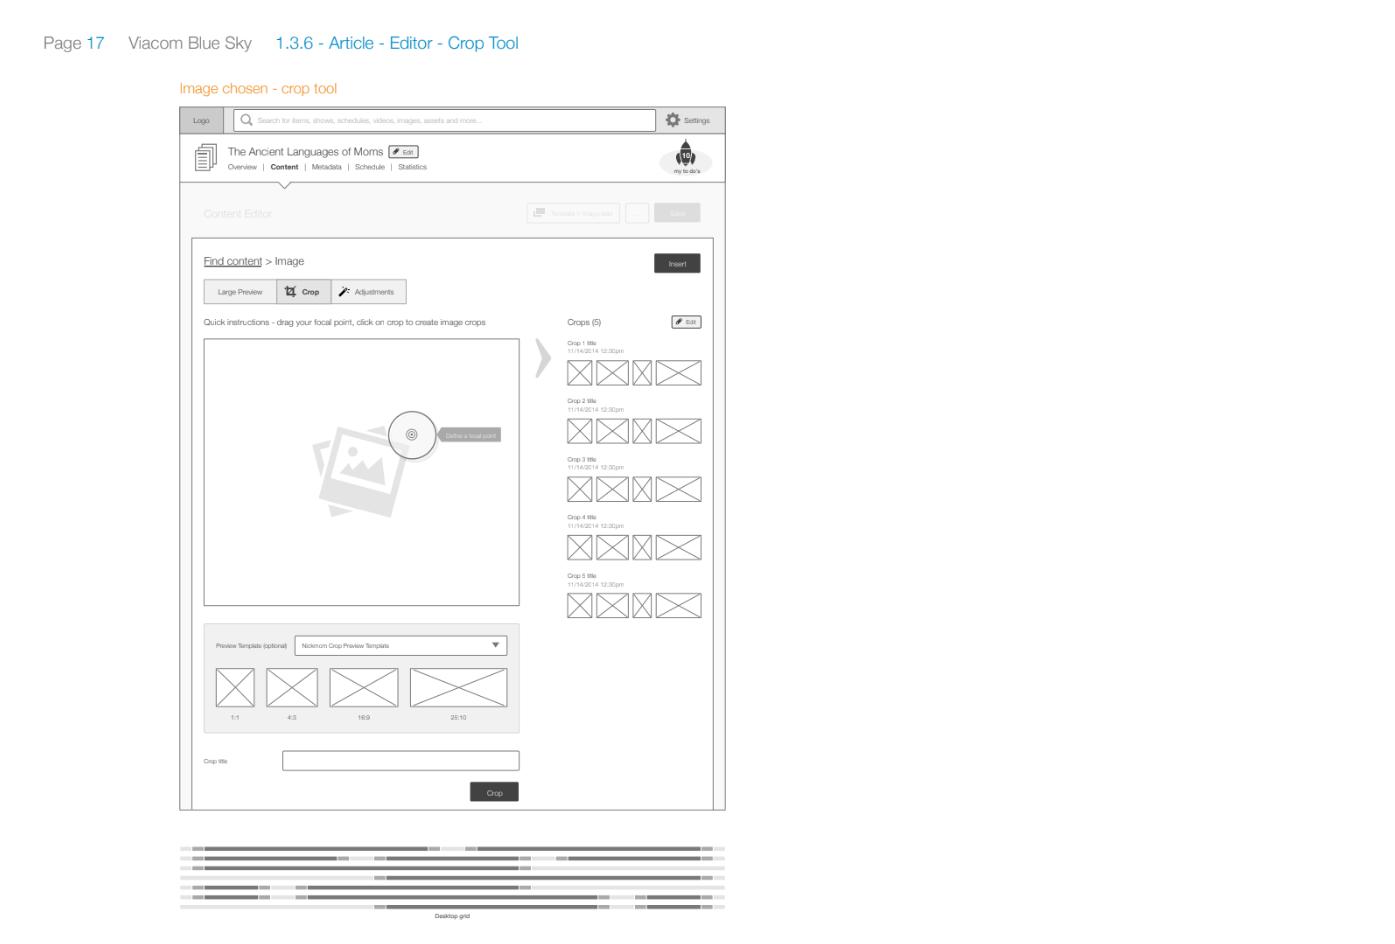 Article image - crop tool